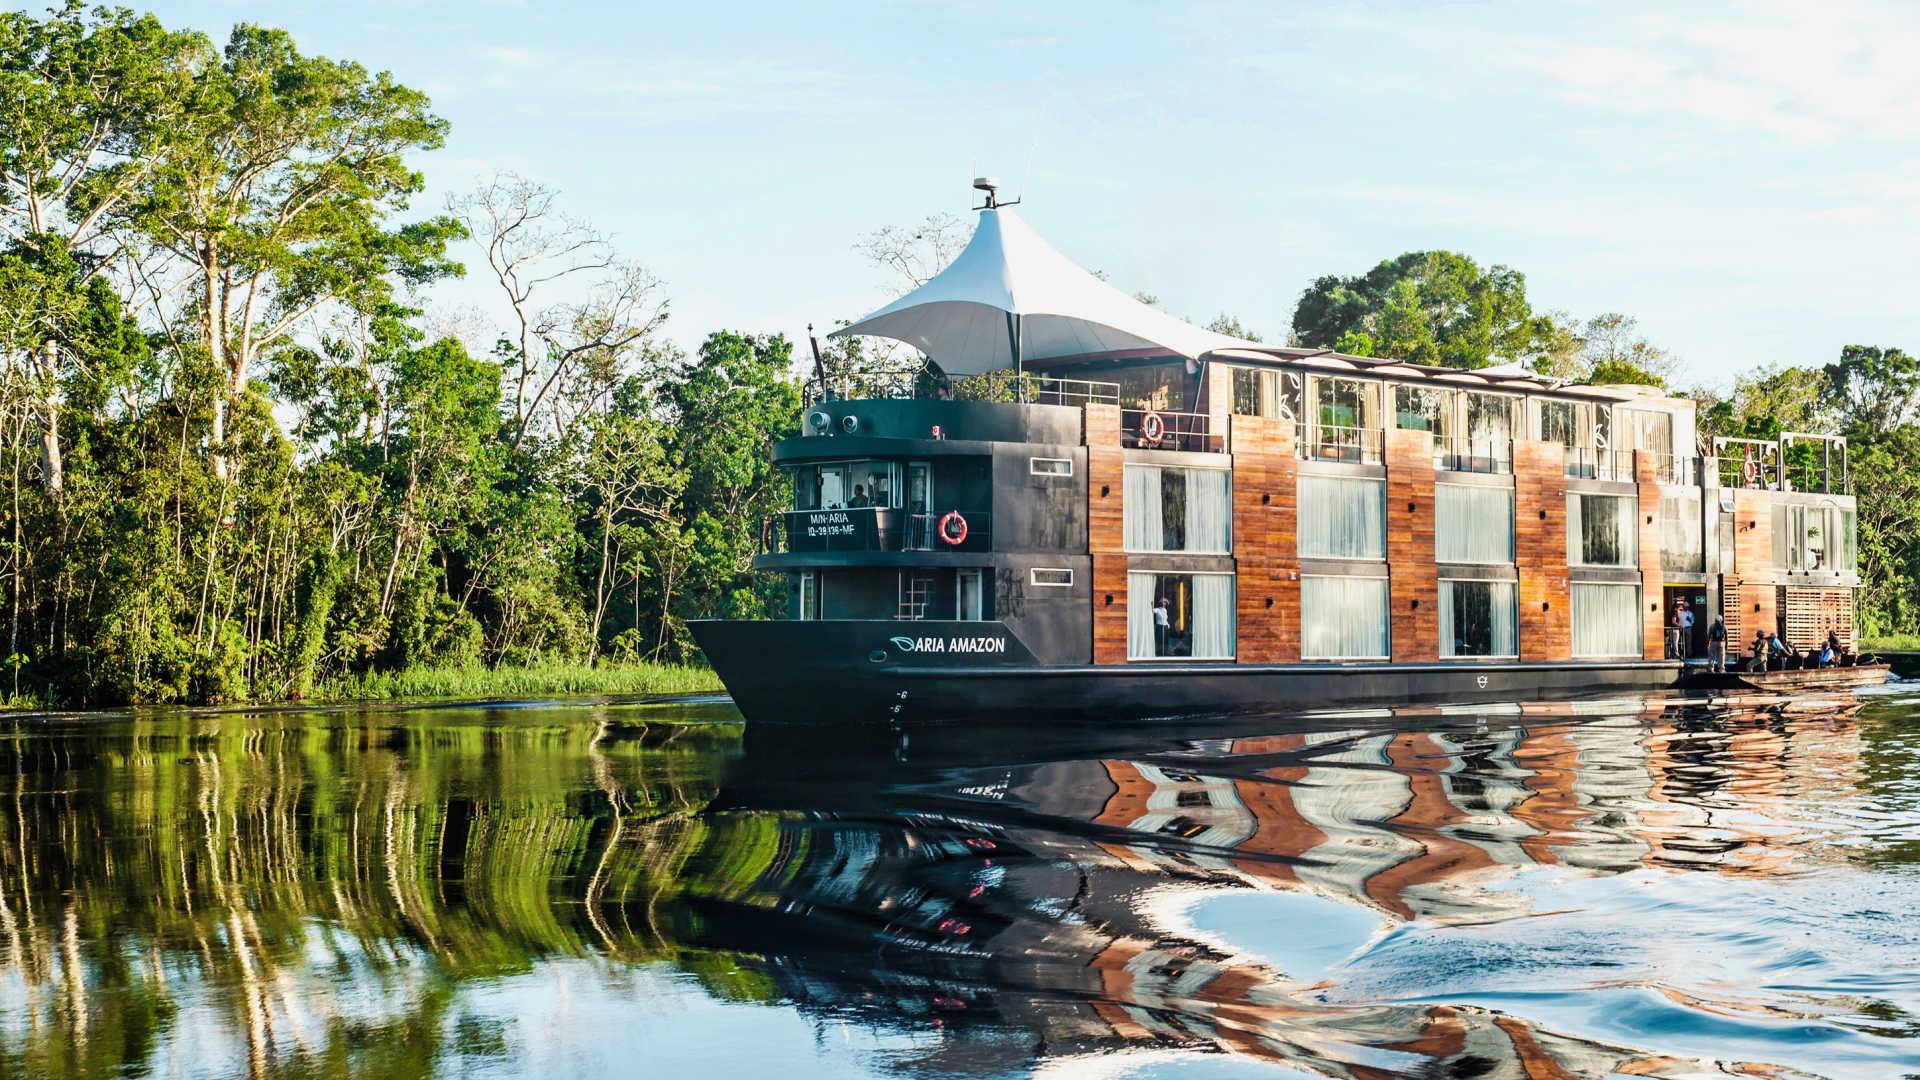 Aria Amazon Luxury Cruise